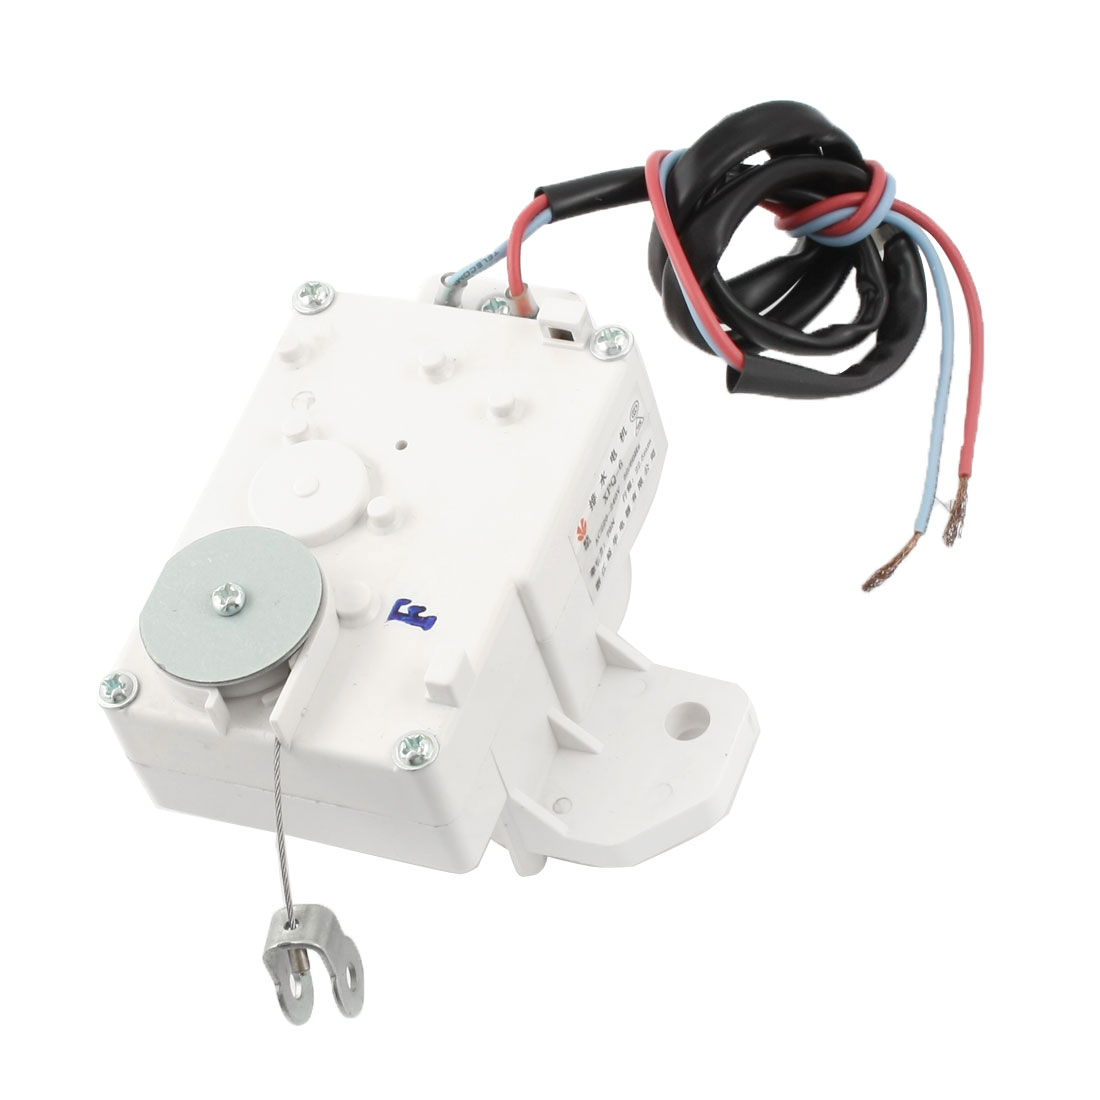 Repair Part 70N Force 22.5mm Stroke Washing Machine Drain Motor Tractor AC 220-240V XPQ-6